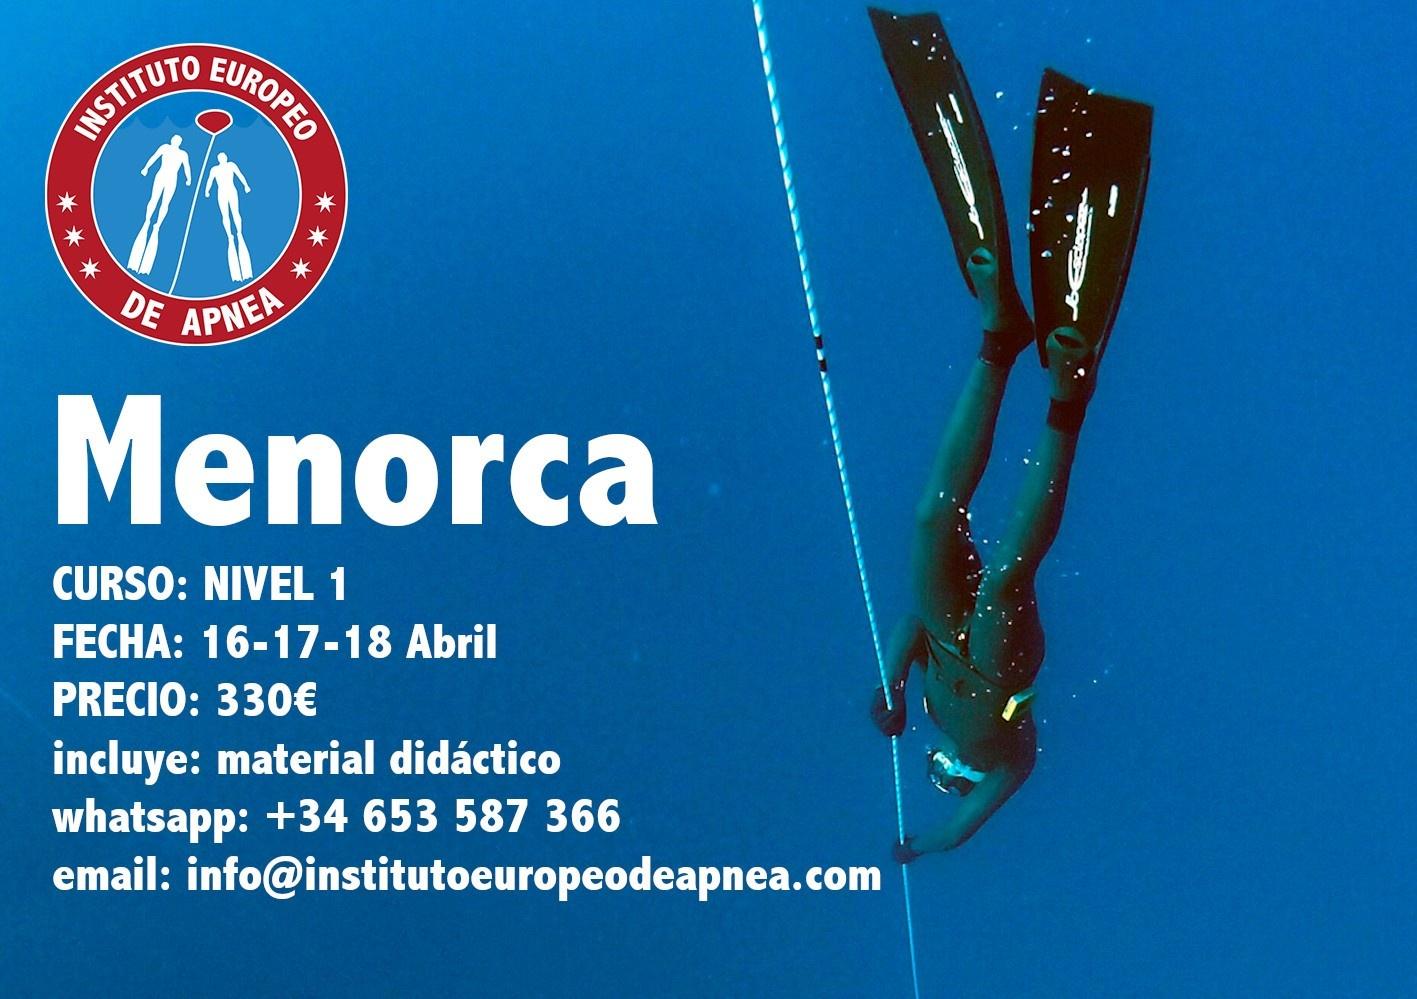 Curso de apnea en Menorca